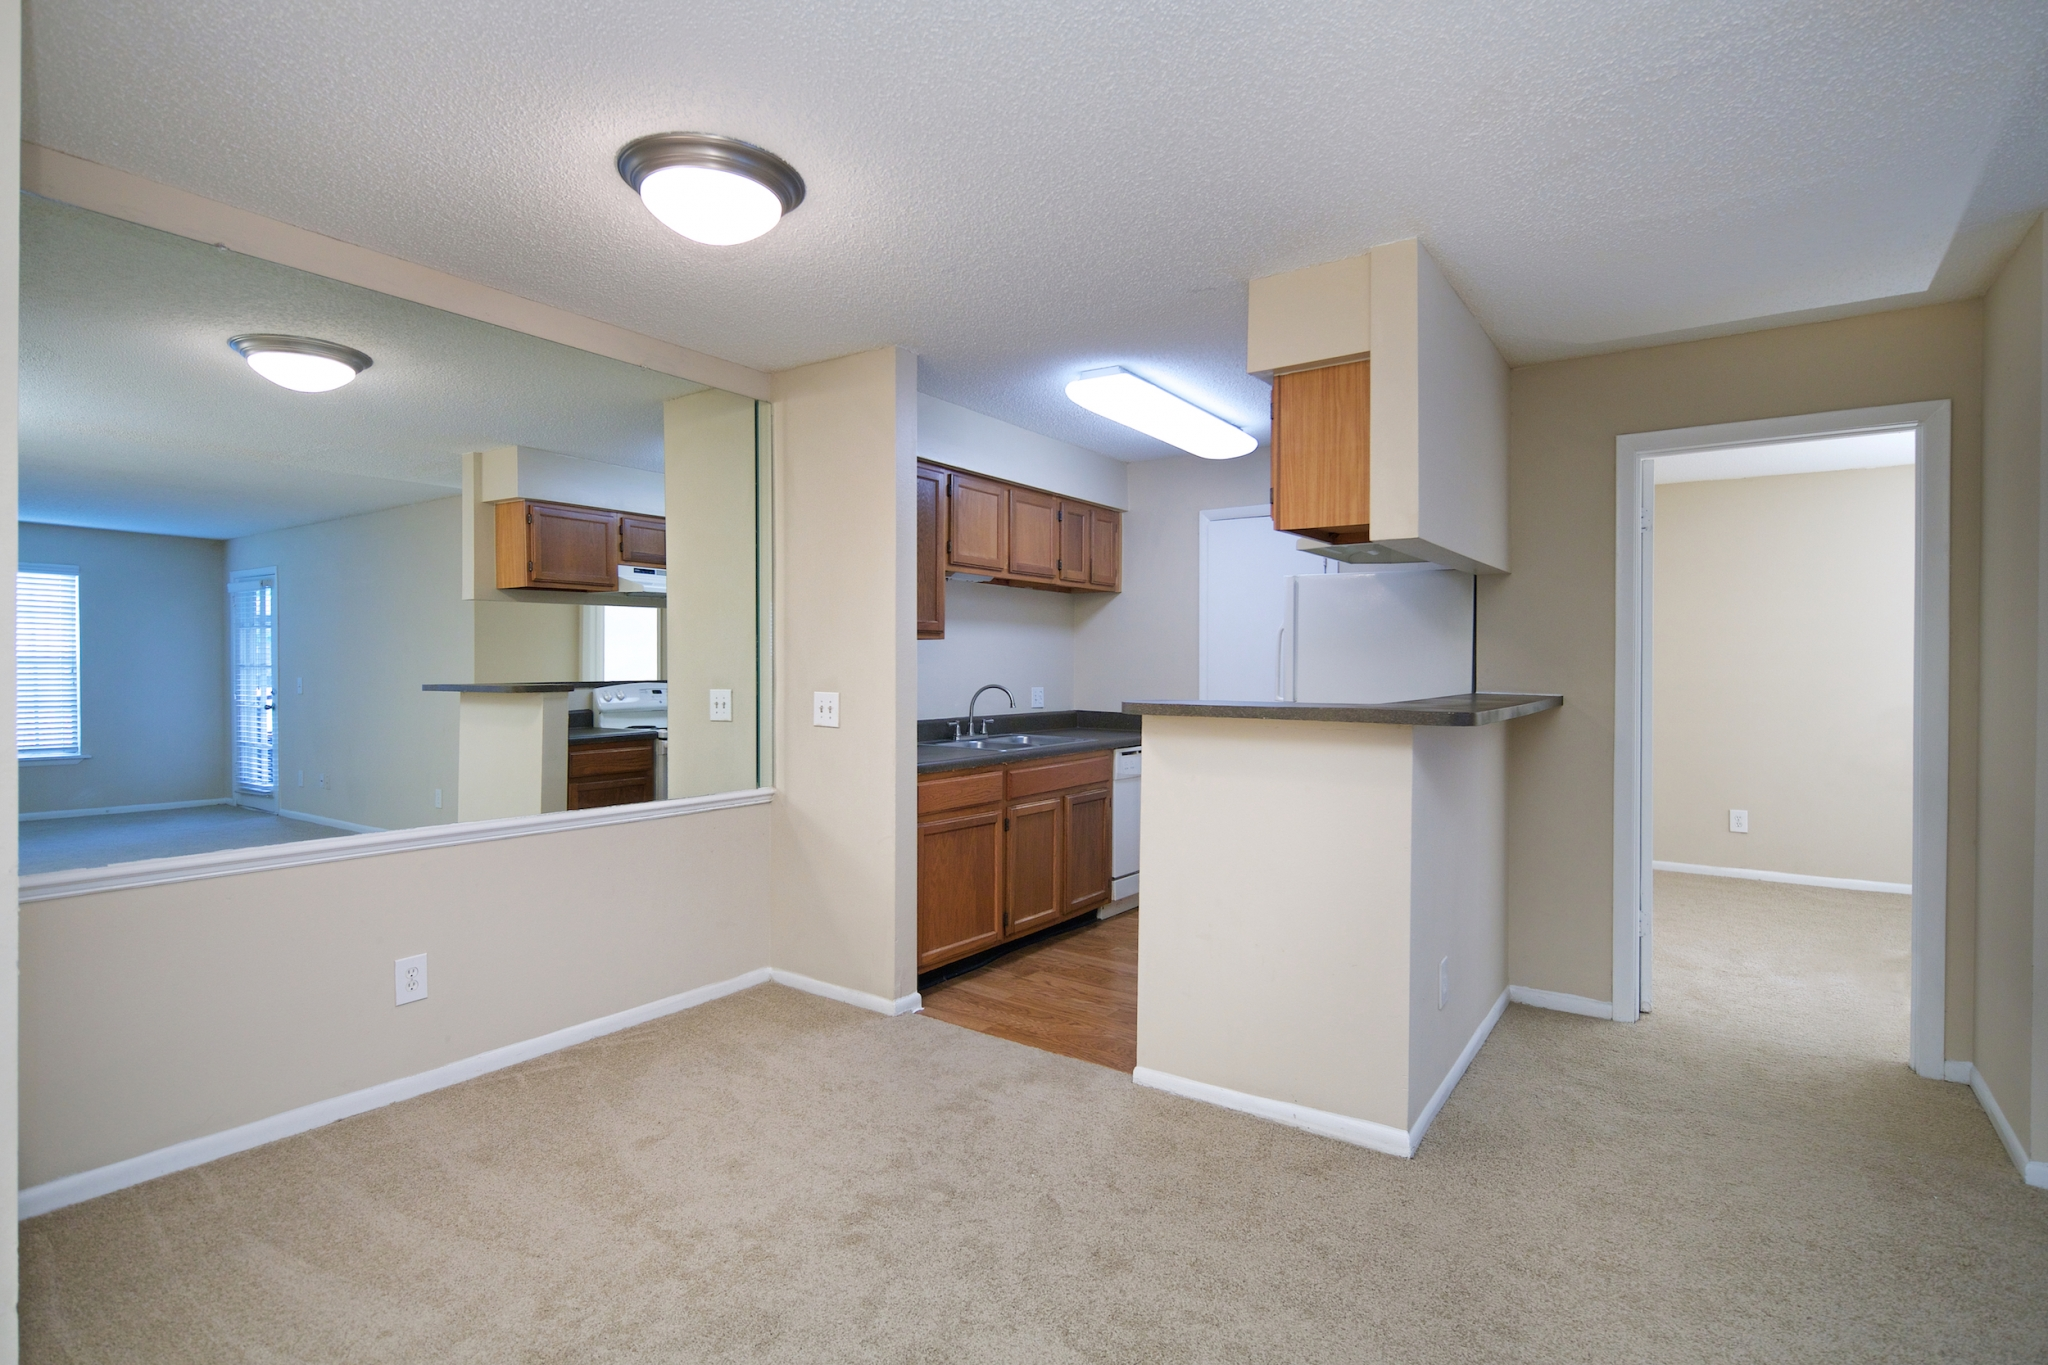 Bentley Green | Apartments for Rent Jacksonville, Florida | Premium Kitchen View